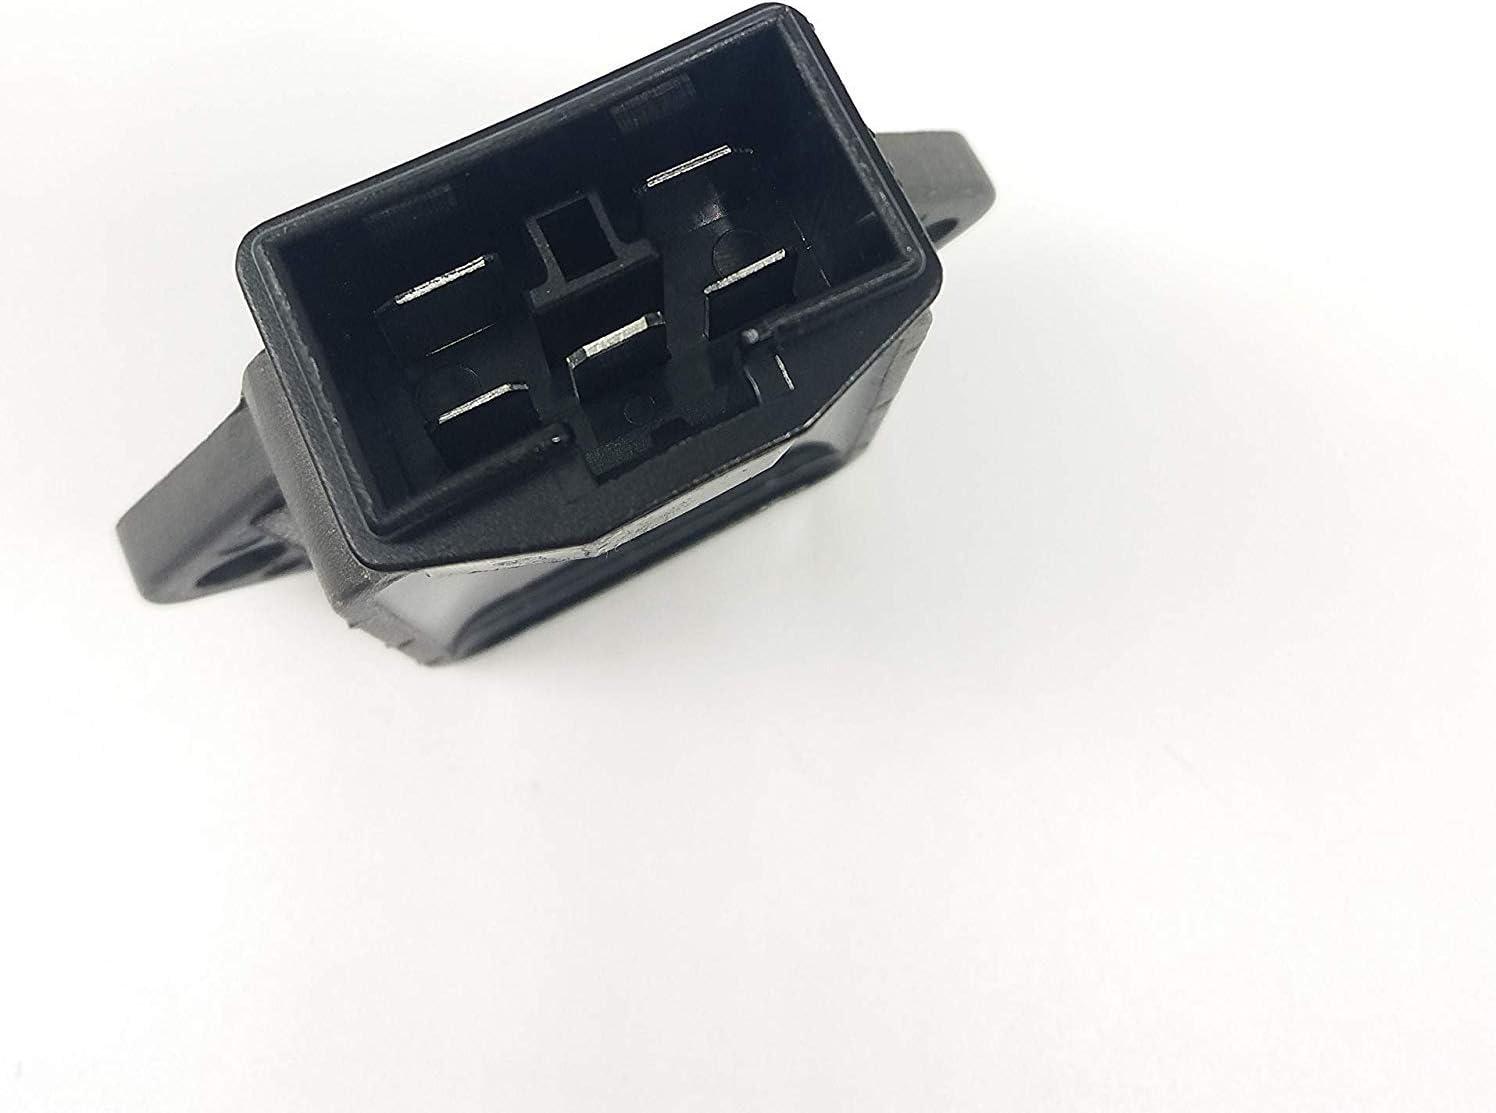 Morii New Voltage Regulator Rectifier Replacement for Honda VT 750 Shadow VTR 1000 F CB 400 F Aprilia RXV 4.5 Husqvarna 125 250 450 Replace 31600-KBG-008 31600-MV4-010 31600-KPJ-670